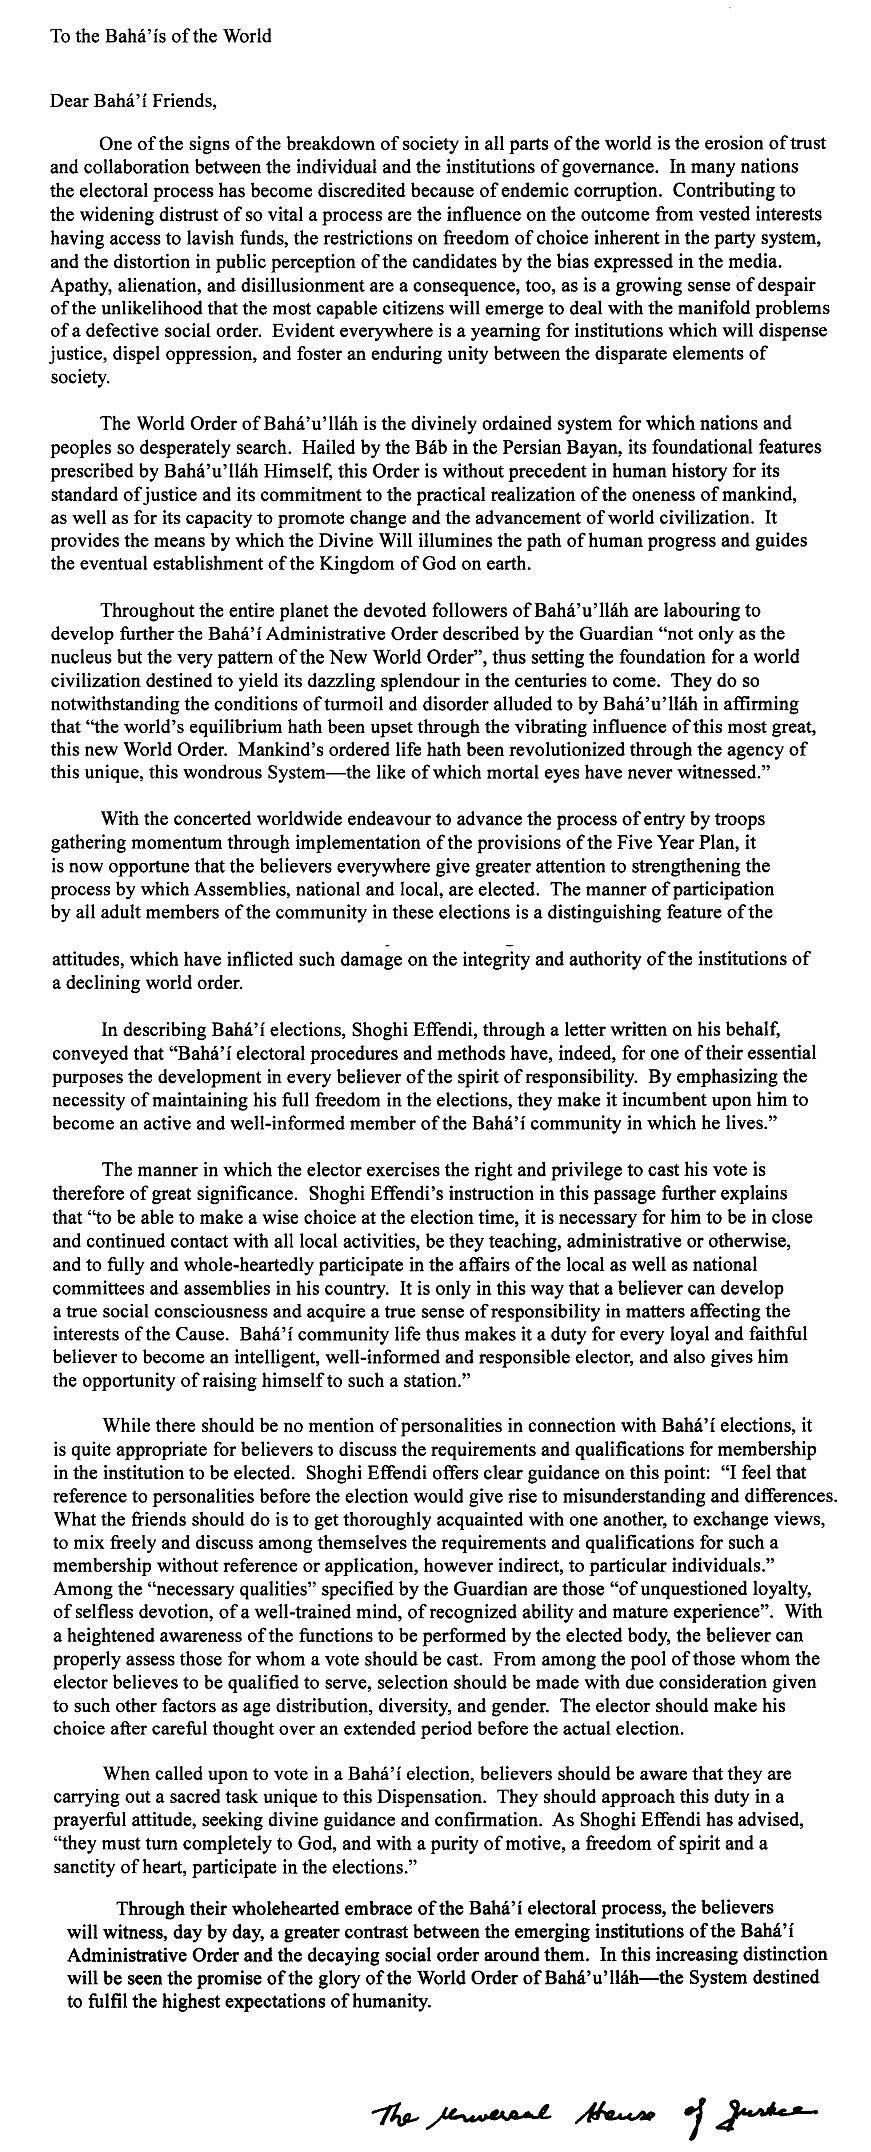 UHJ March 25 2007 letter.jpg